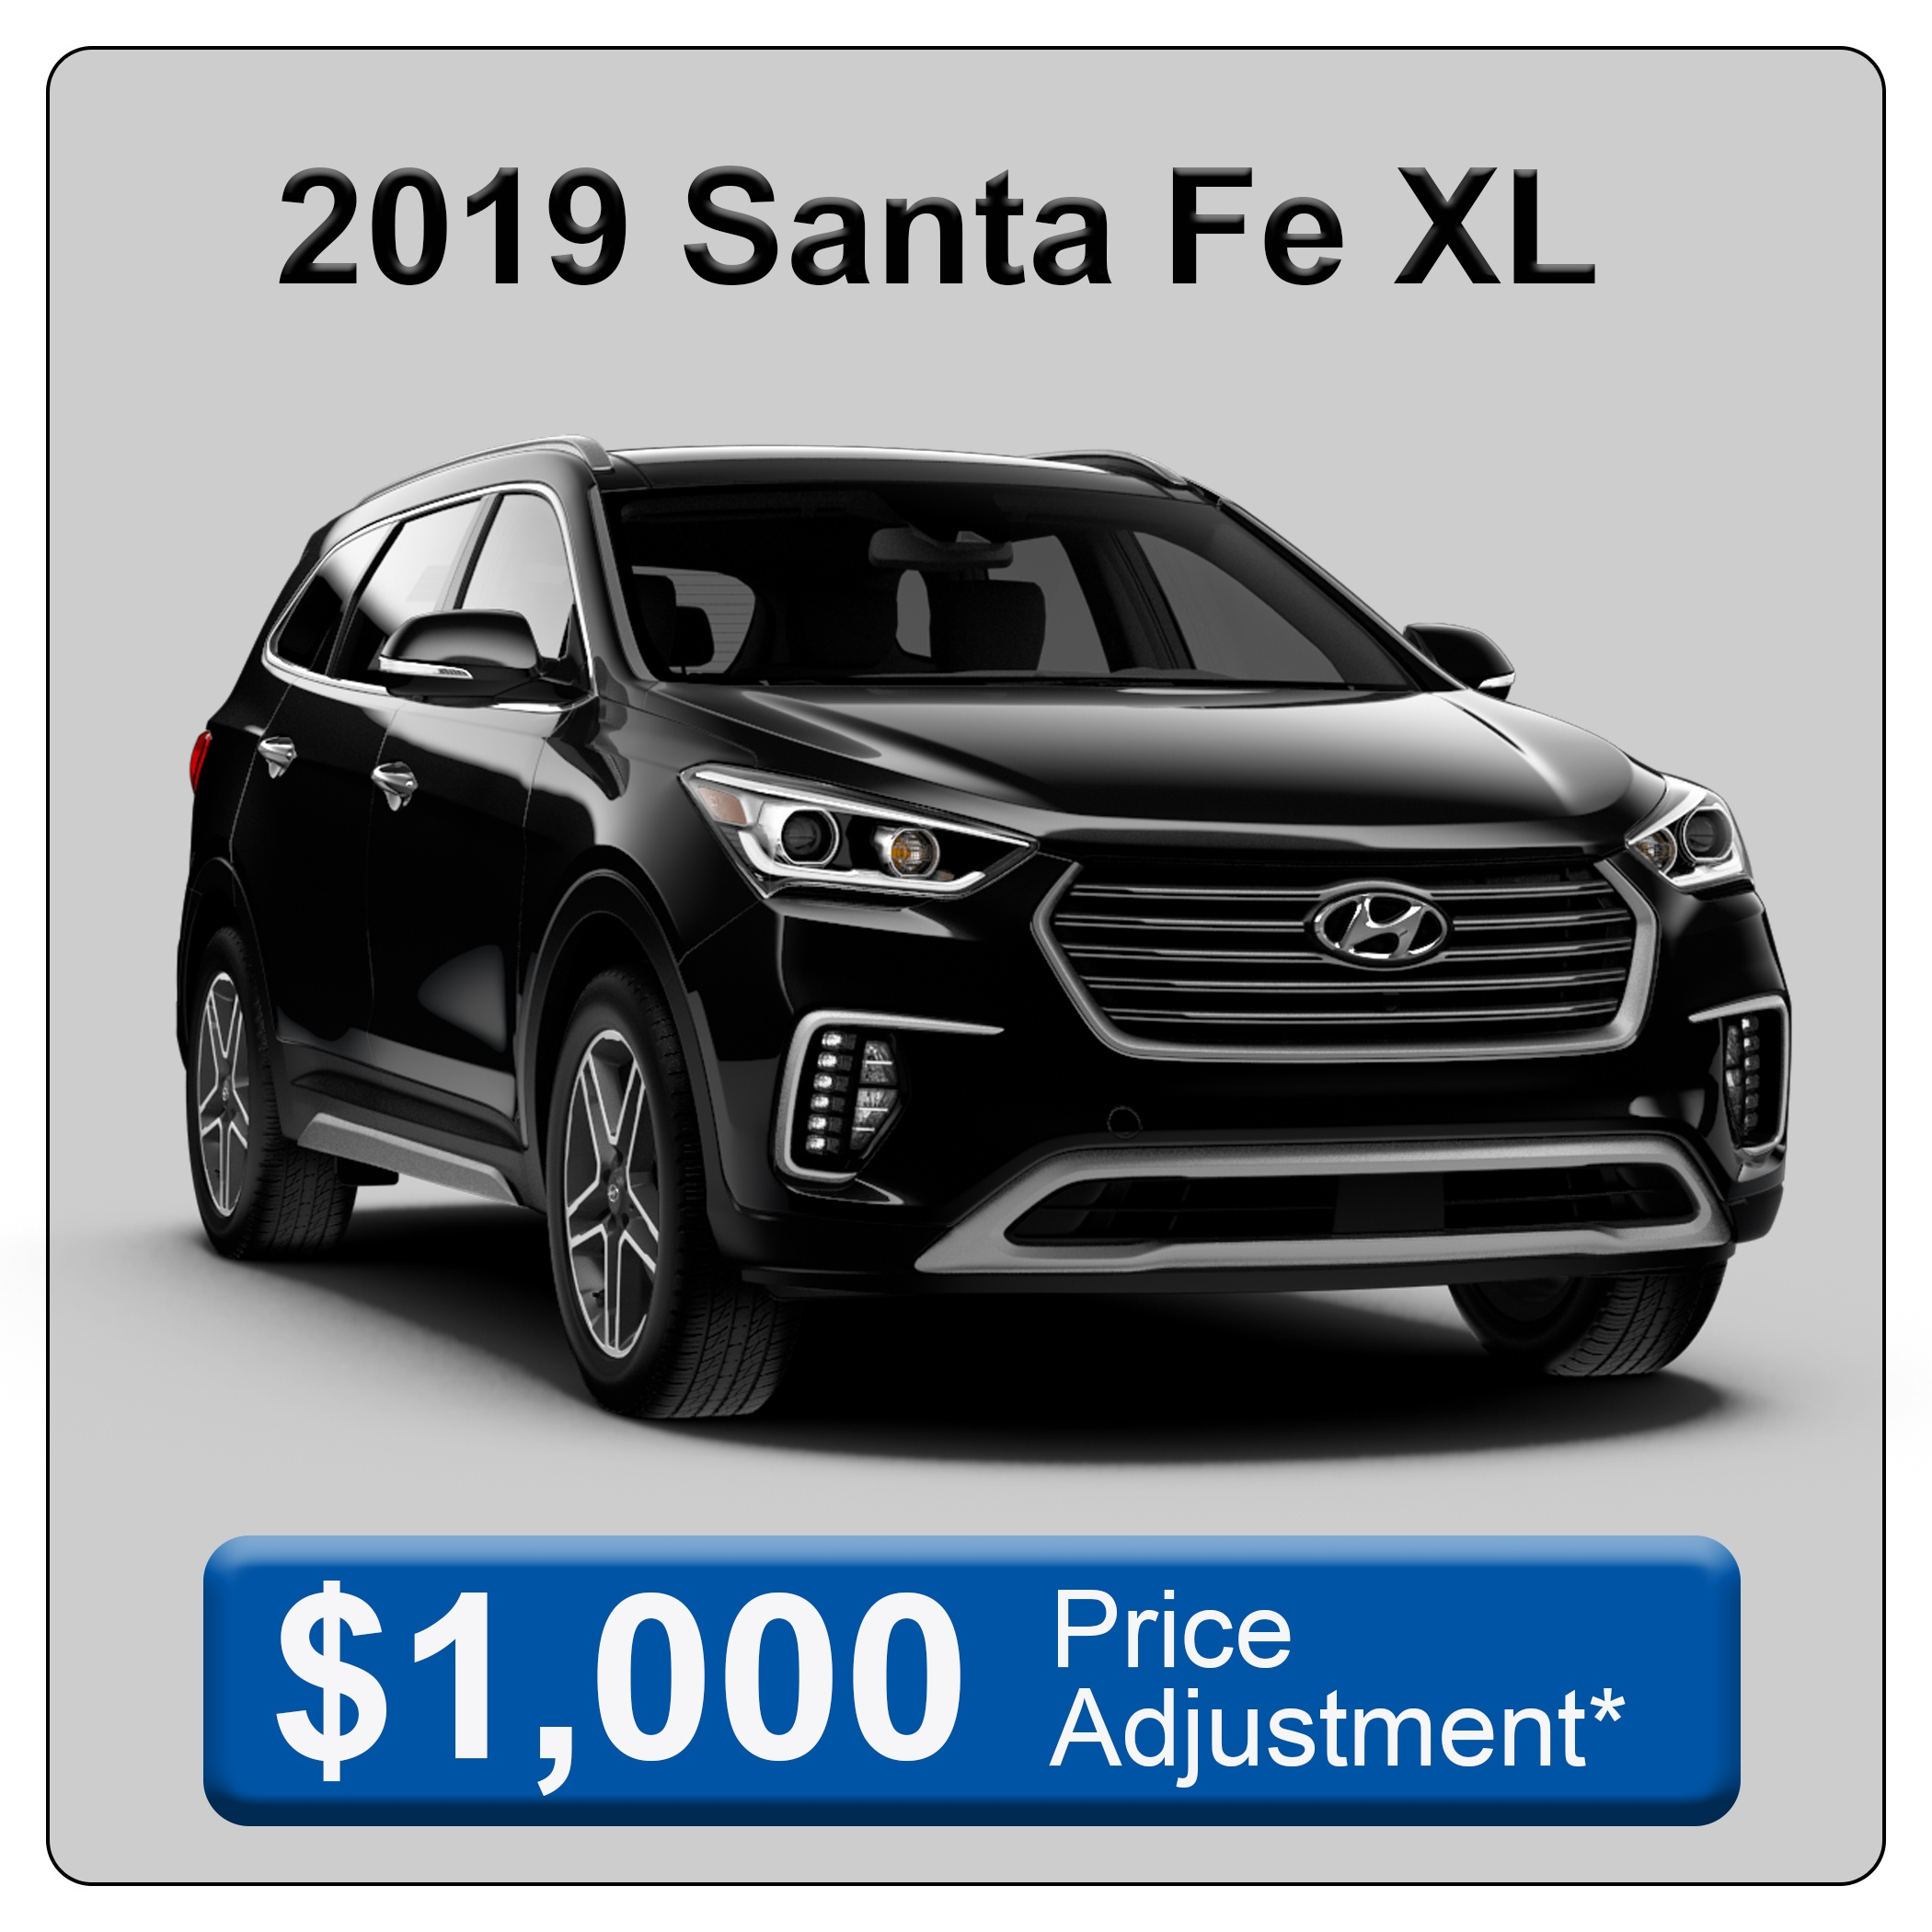 2019 Santa Fe XL